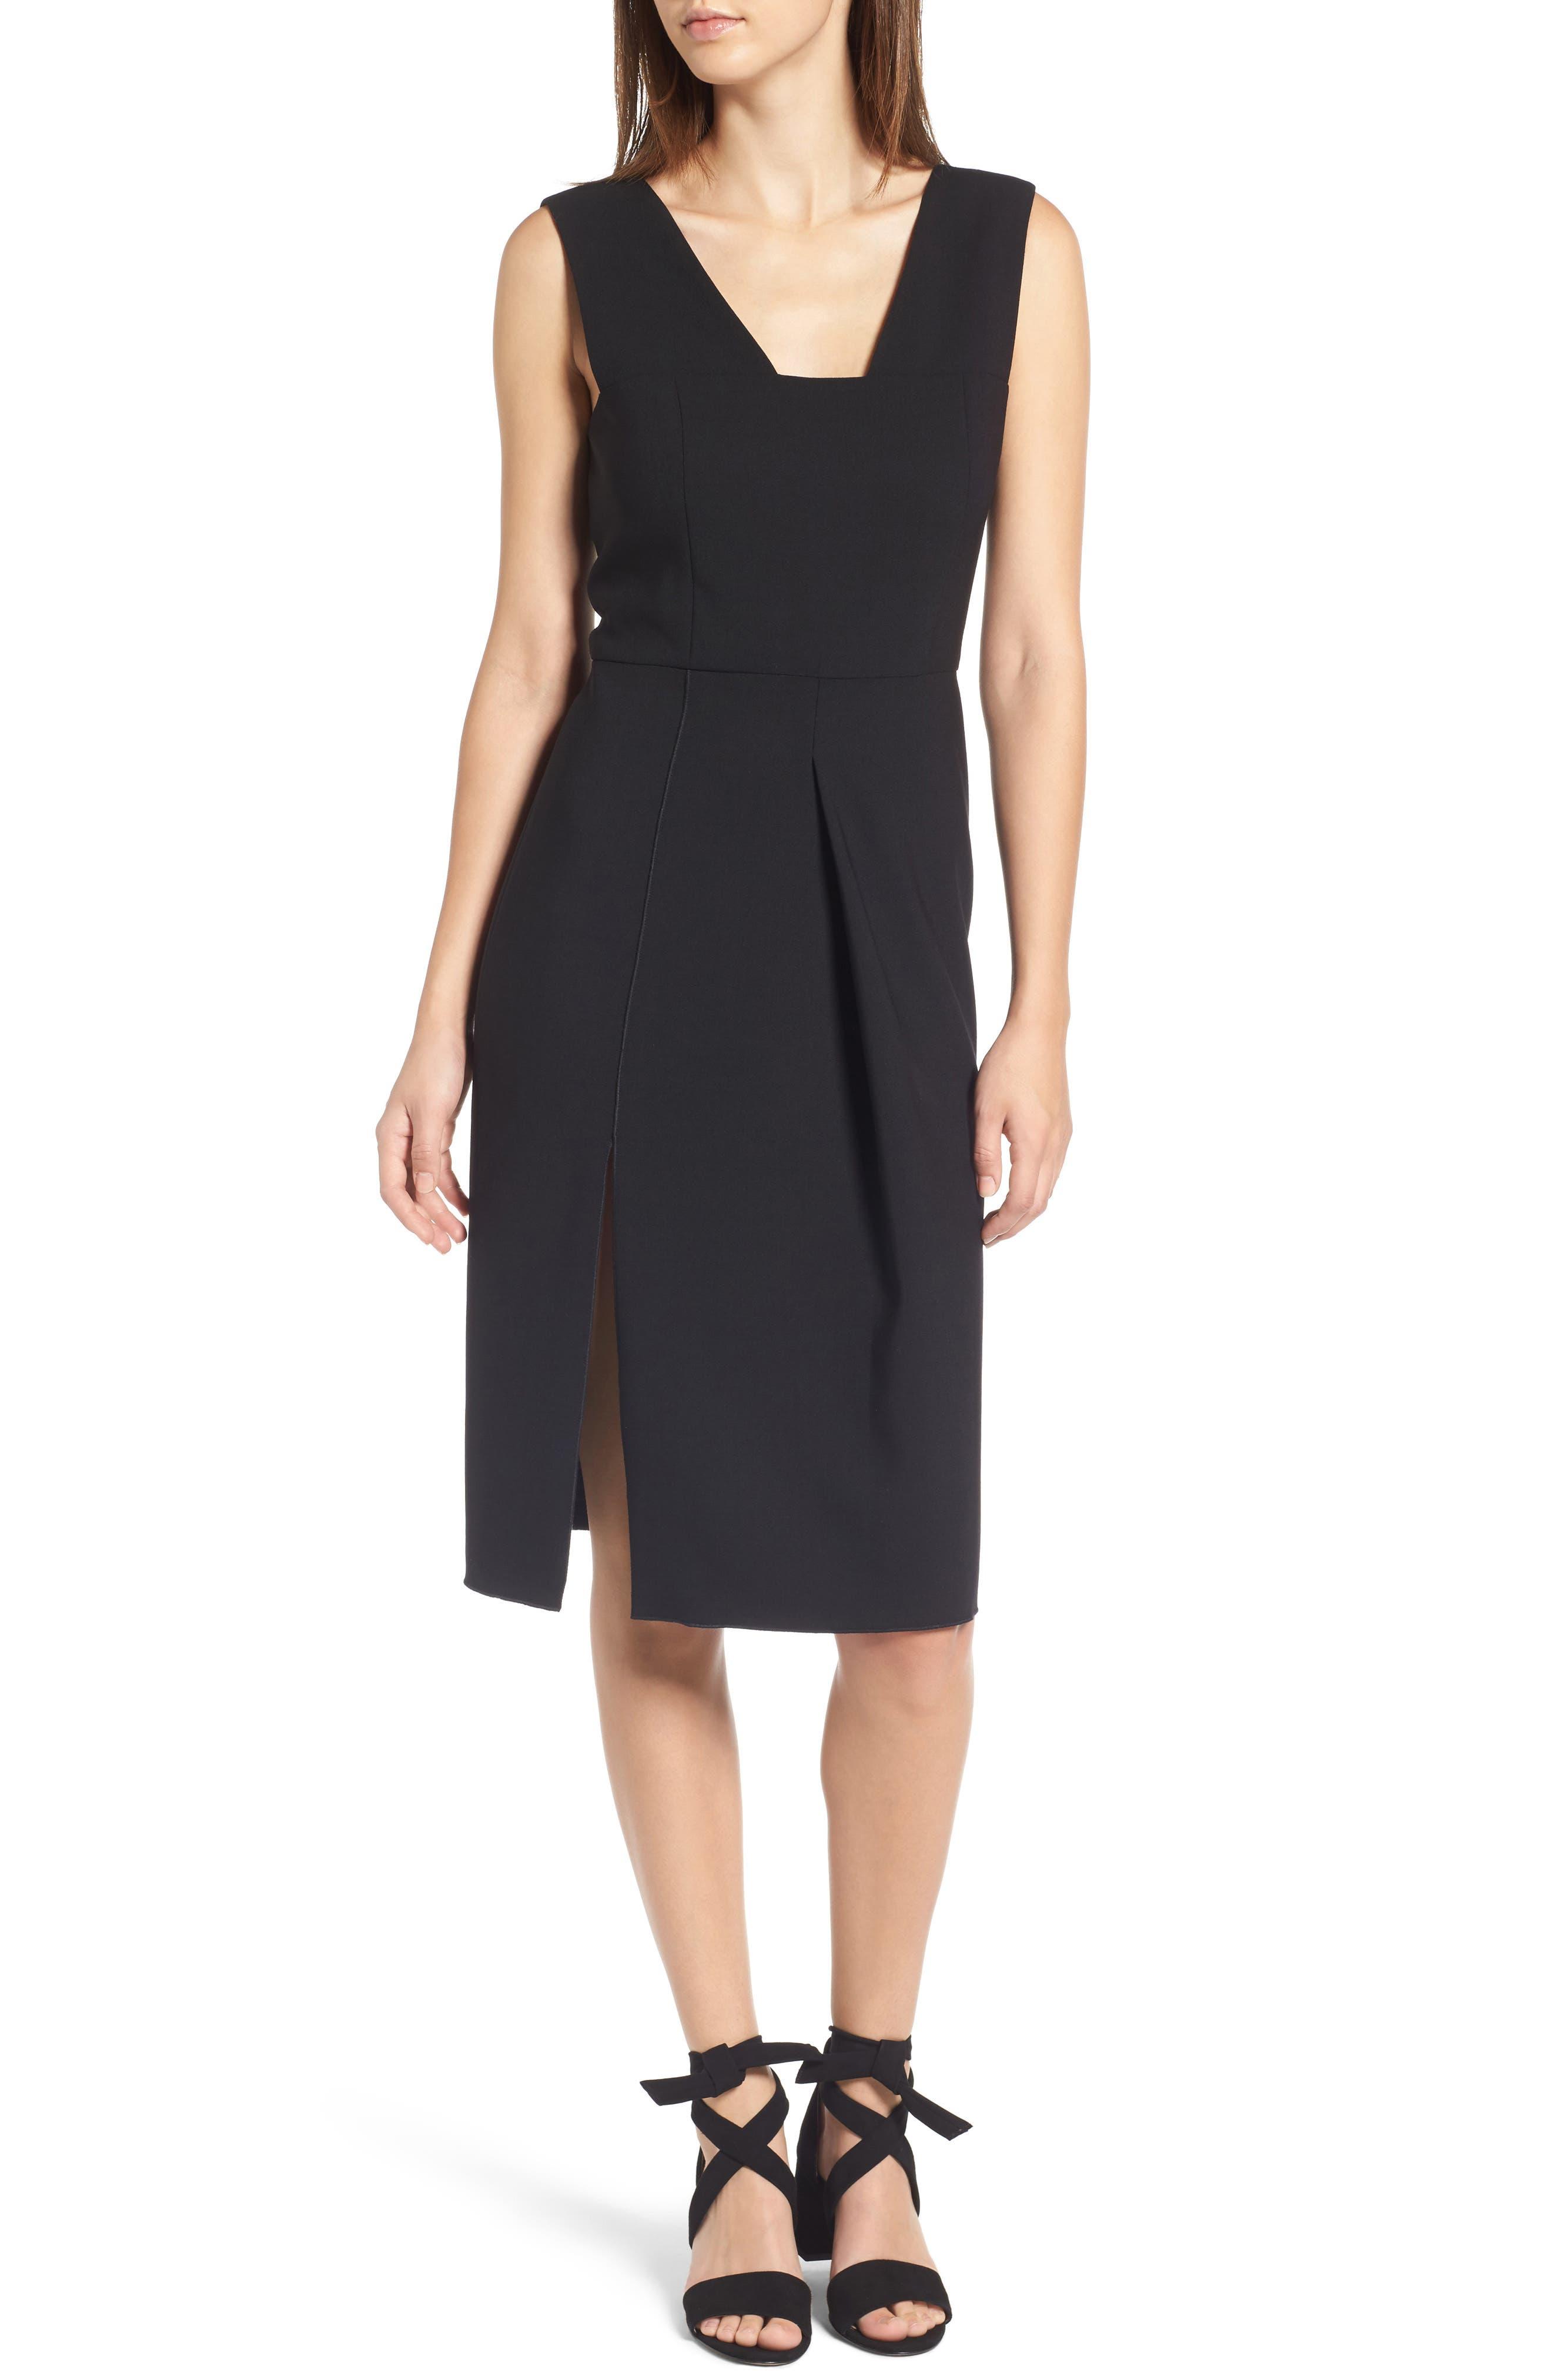 Lewit Corset Detail Stretch Wool Sheath Dress